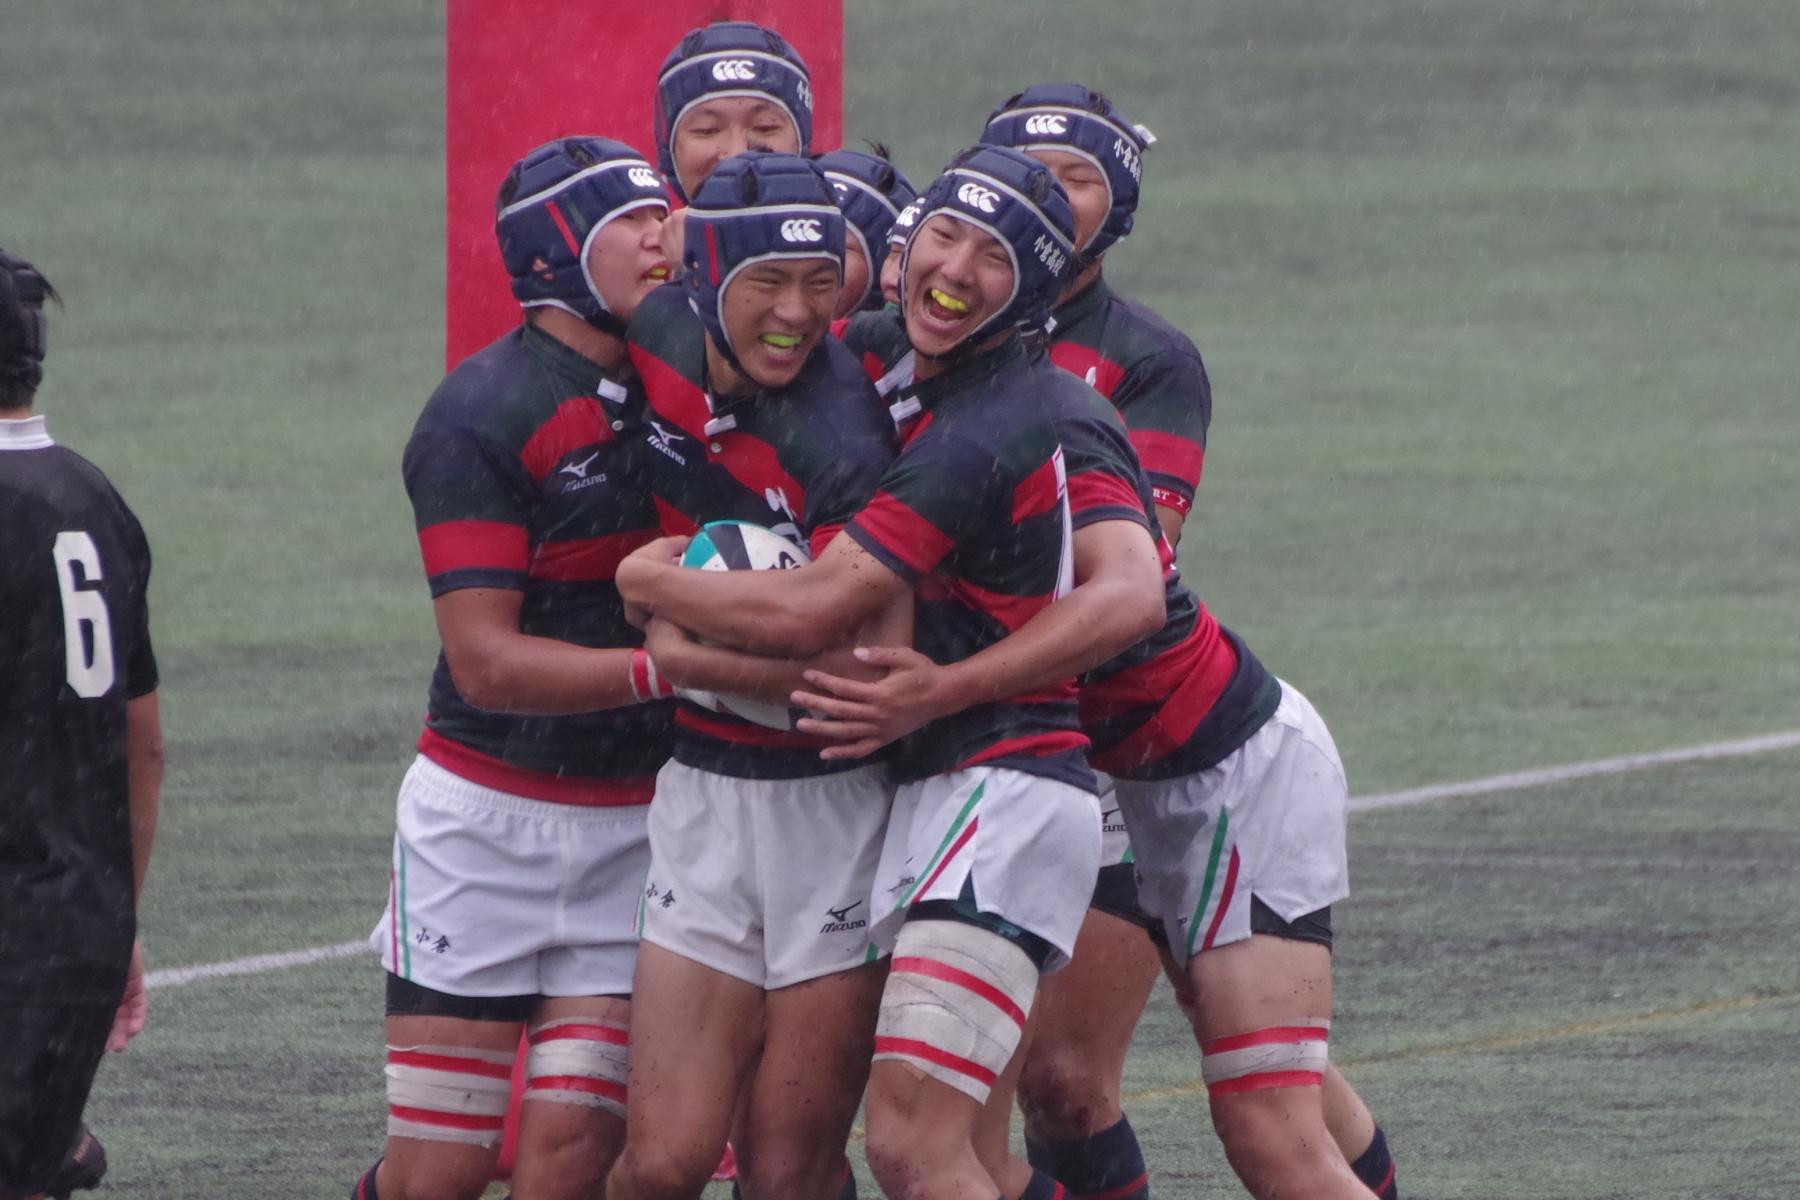 http://kokura-rugby.sakura.ne.jp/180513_140512_0397.jpg